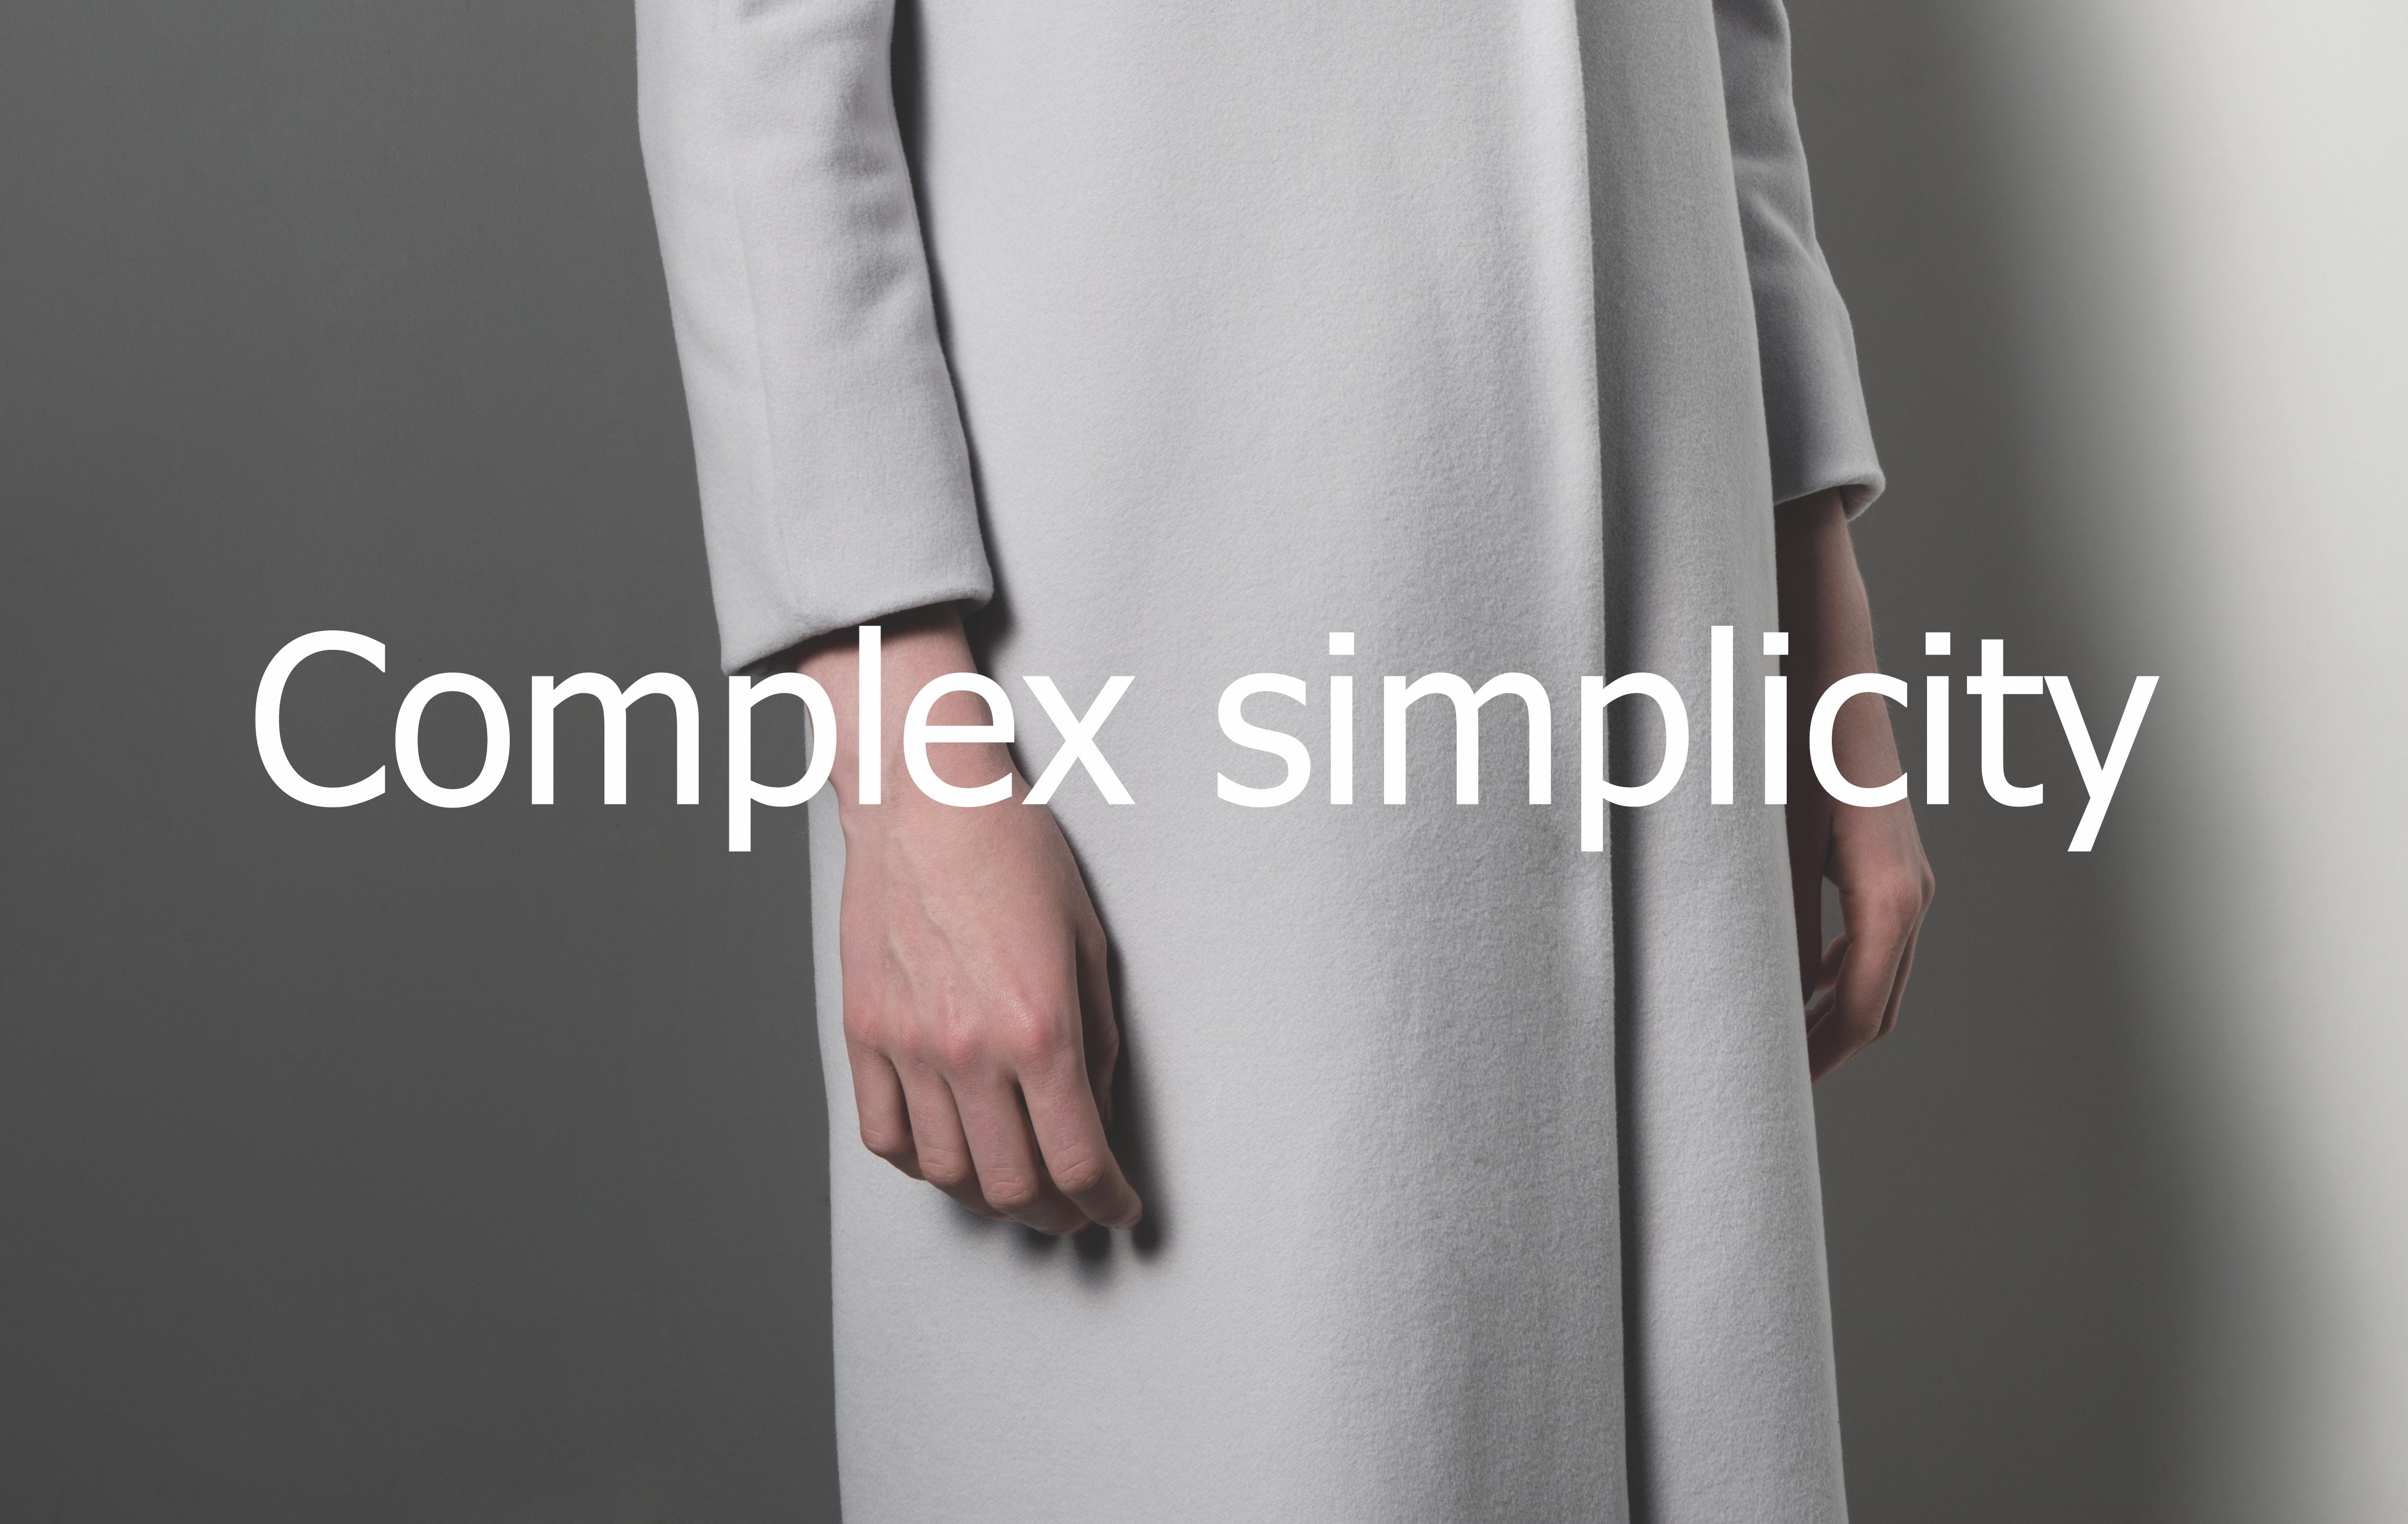 Badgecomplexsimplicity